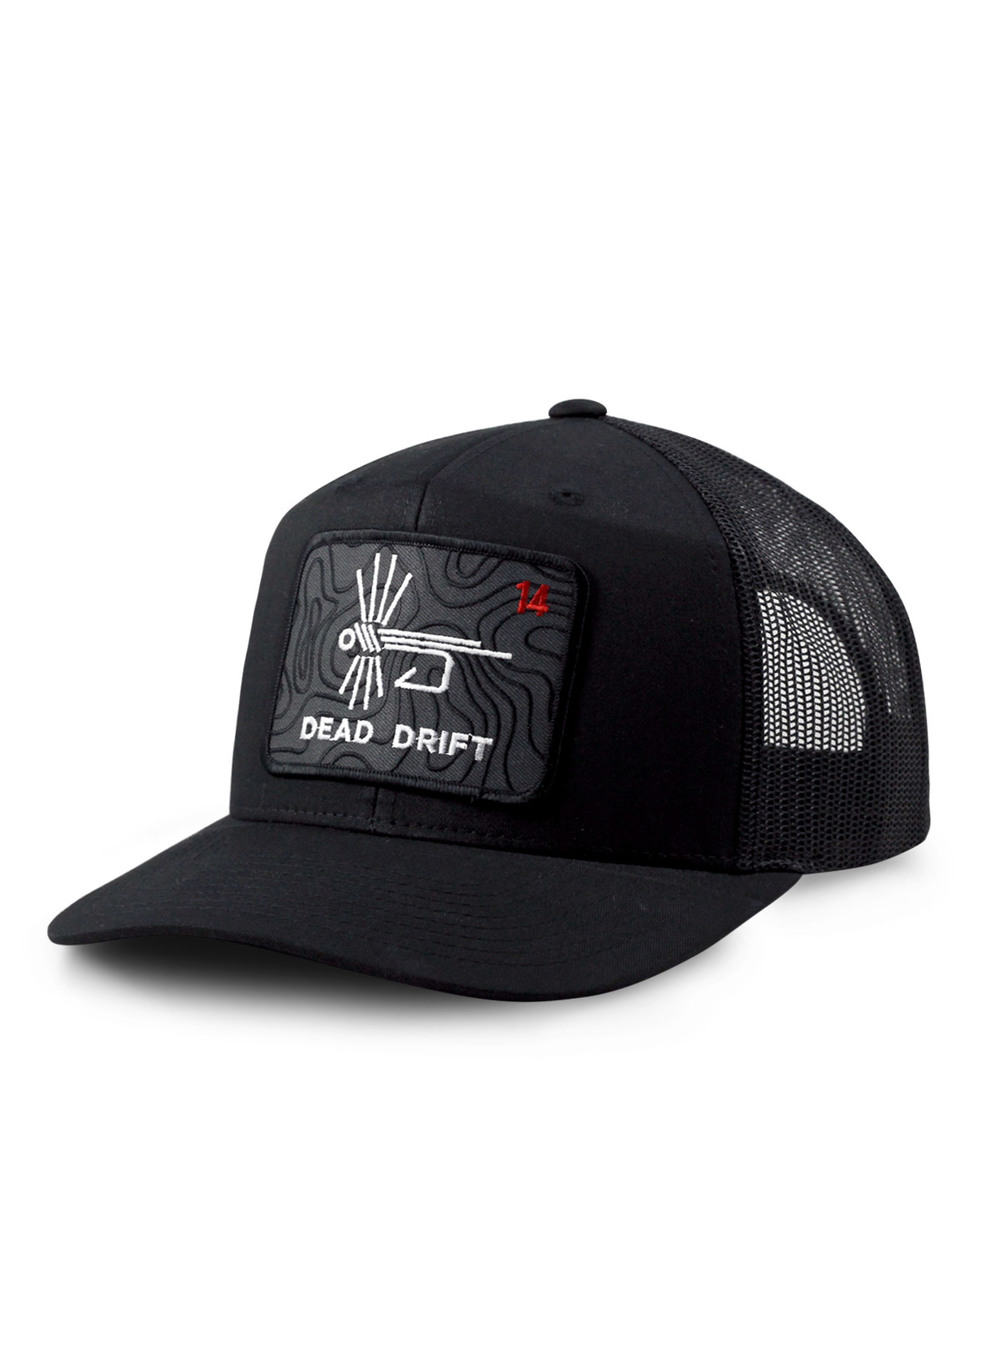 db7b1db03dad0 Dead Drift Fly Topo Logo Trucker Hat — Dead Drift